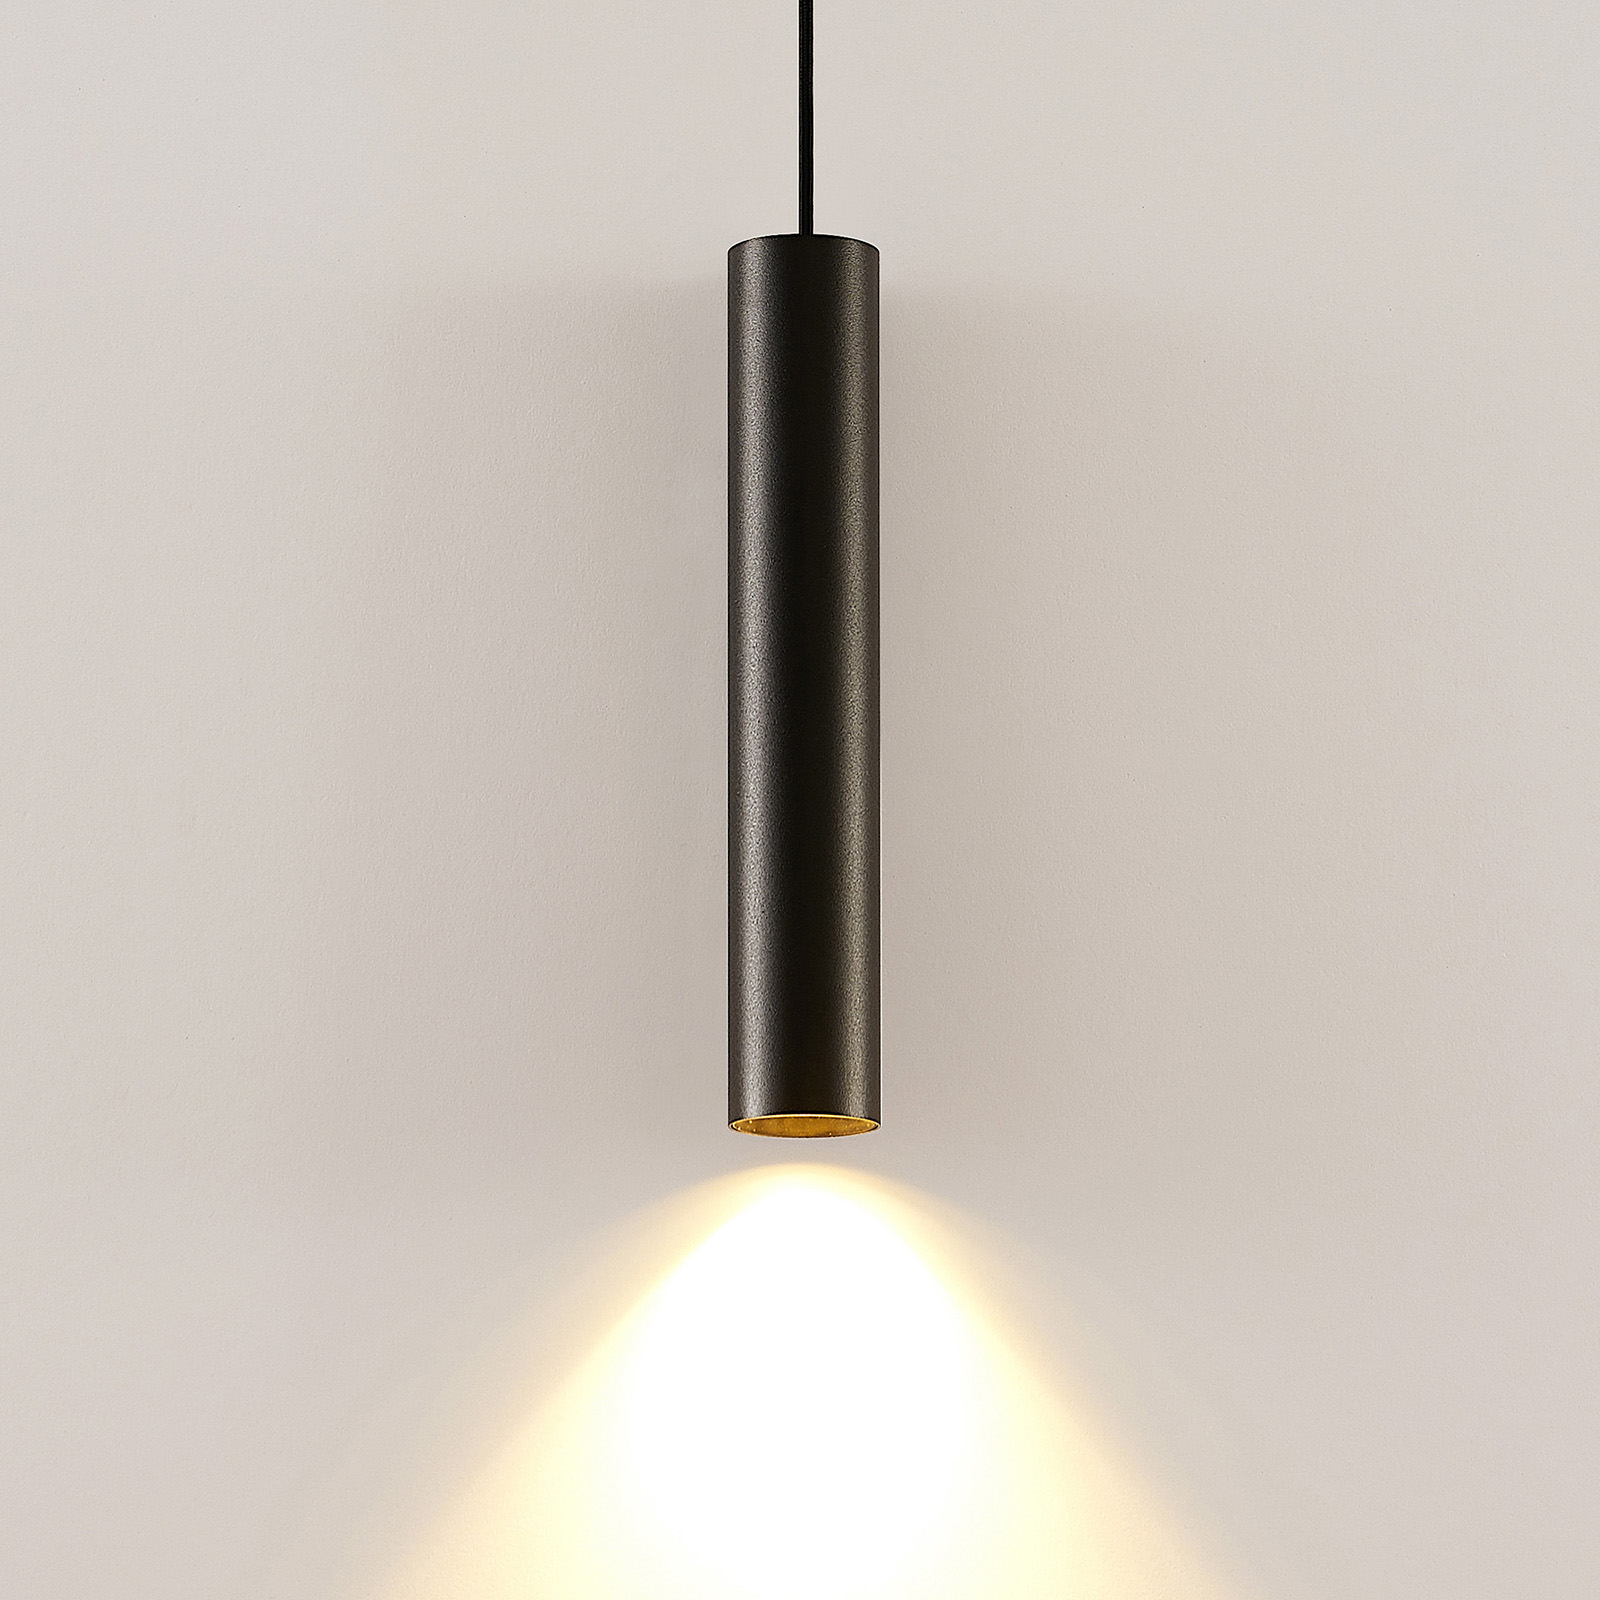 Arcchio Ejona hanglamp, hoogte 35 cm, zwart